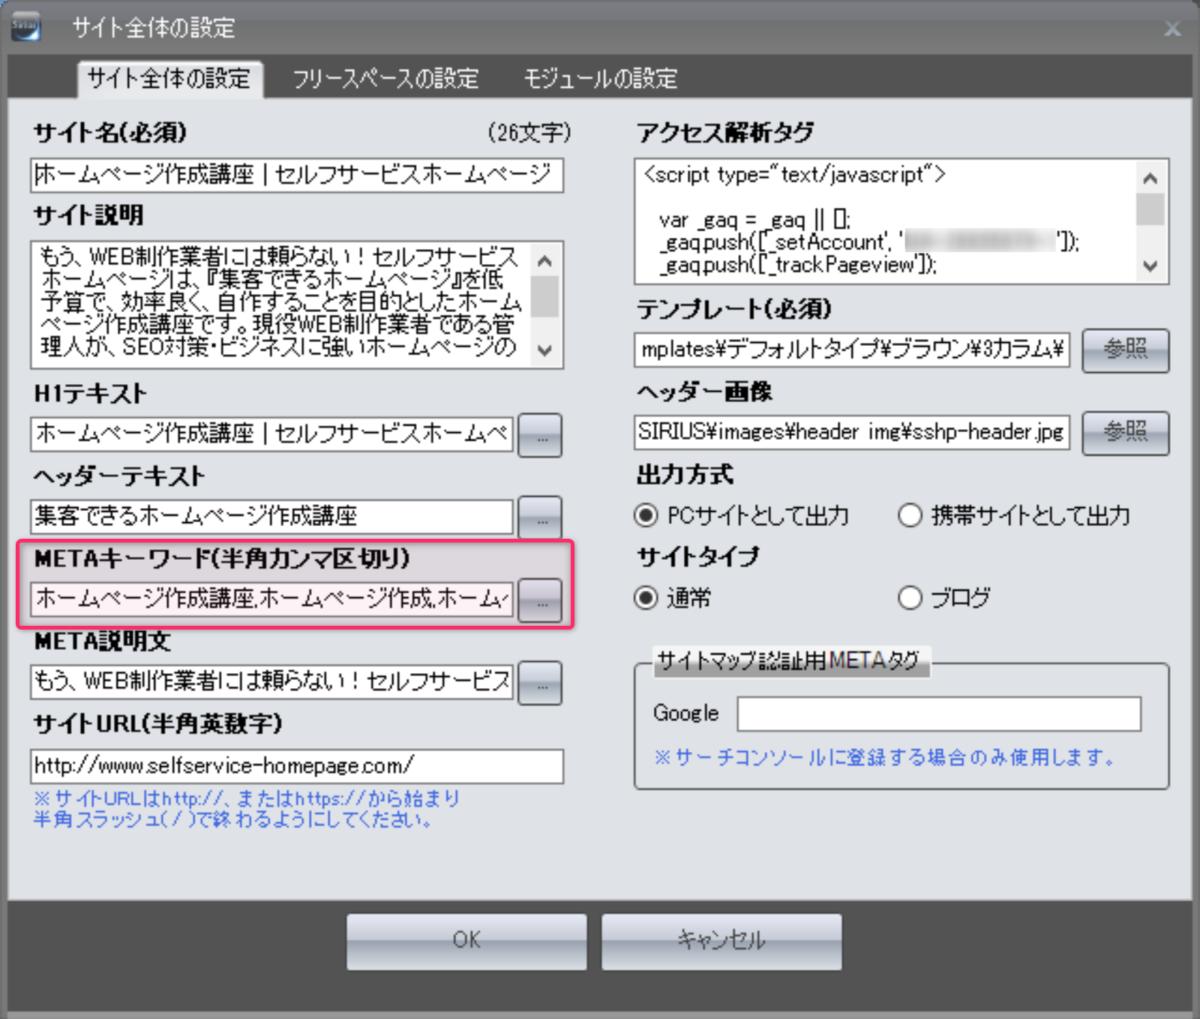 SIRIUSサイト全体設定のMETAキーワードは、サイト全体のmeta keywordタグとなる。